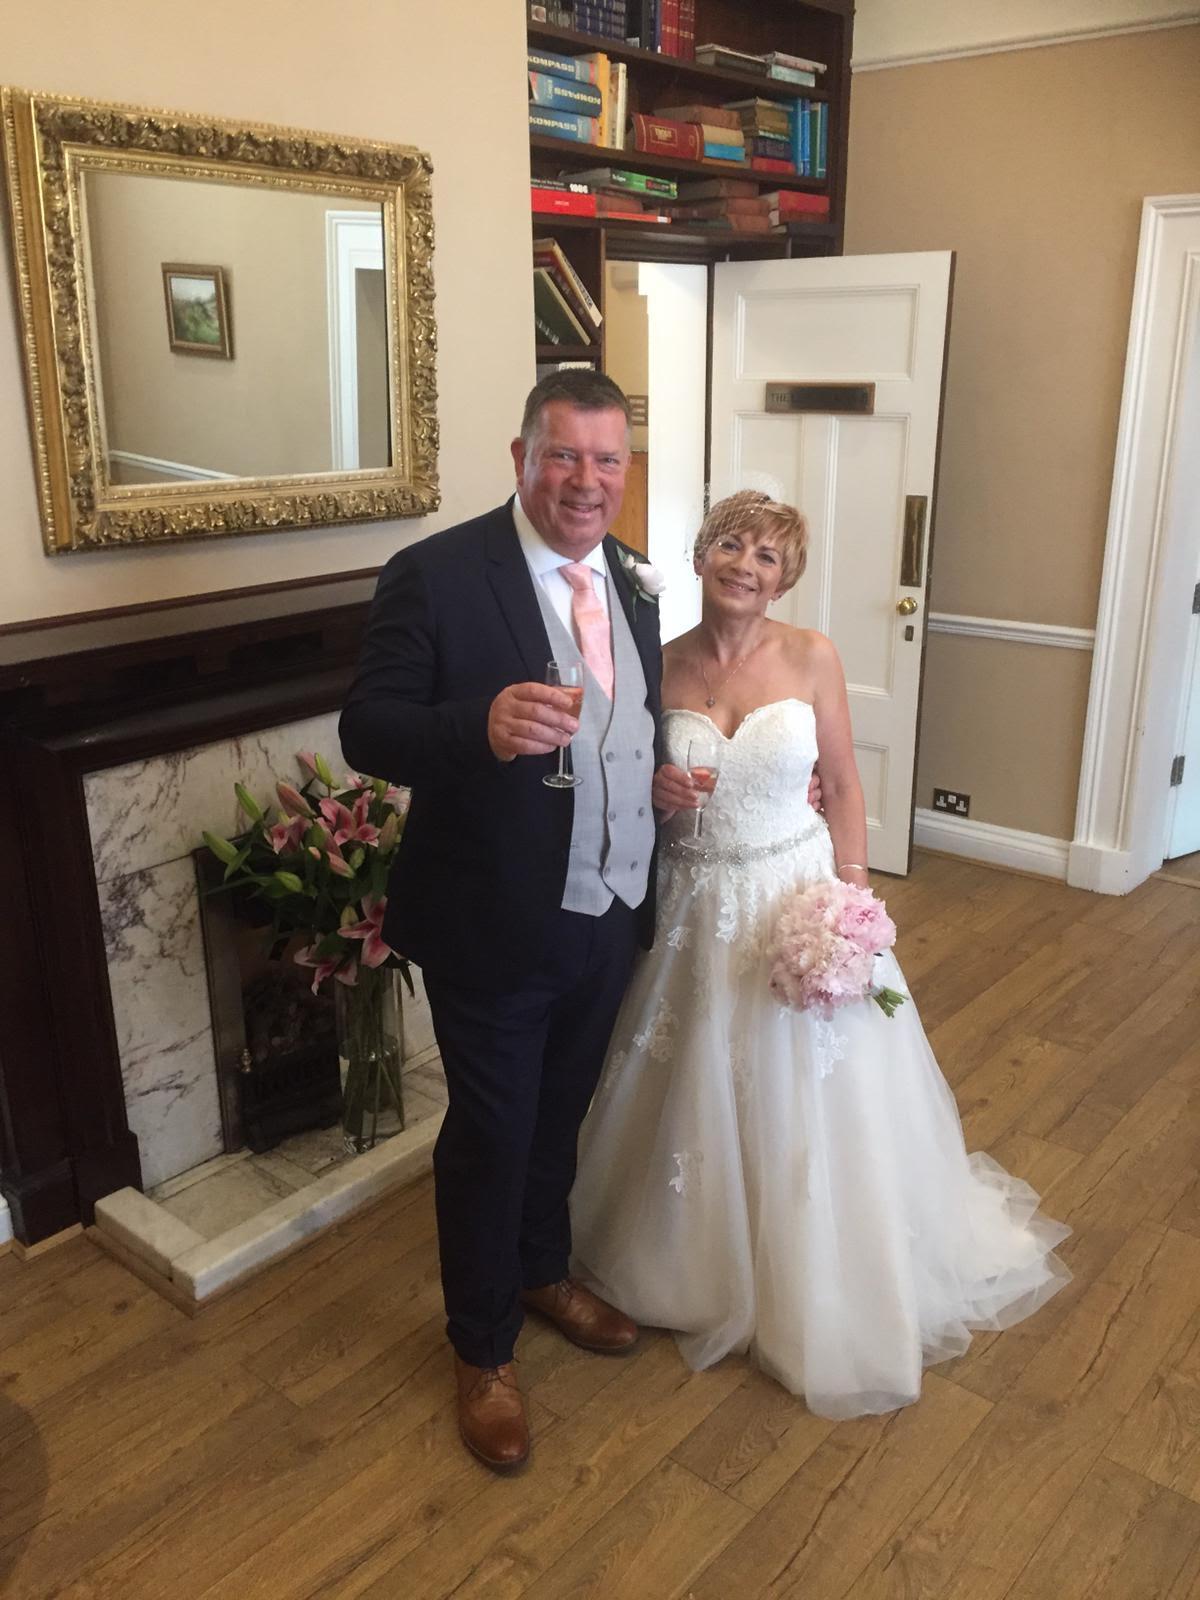 peonies in a wedding bouquet